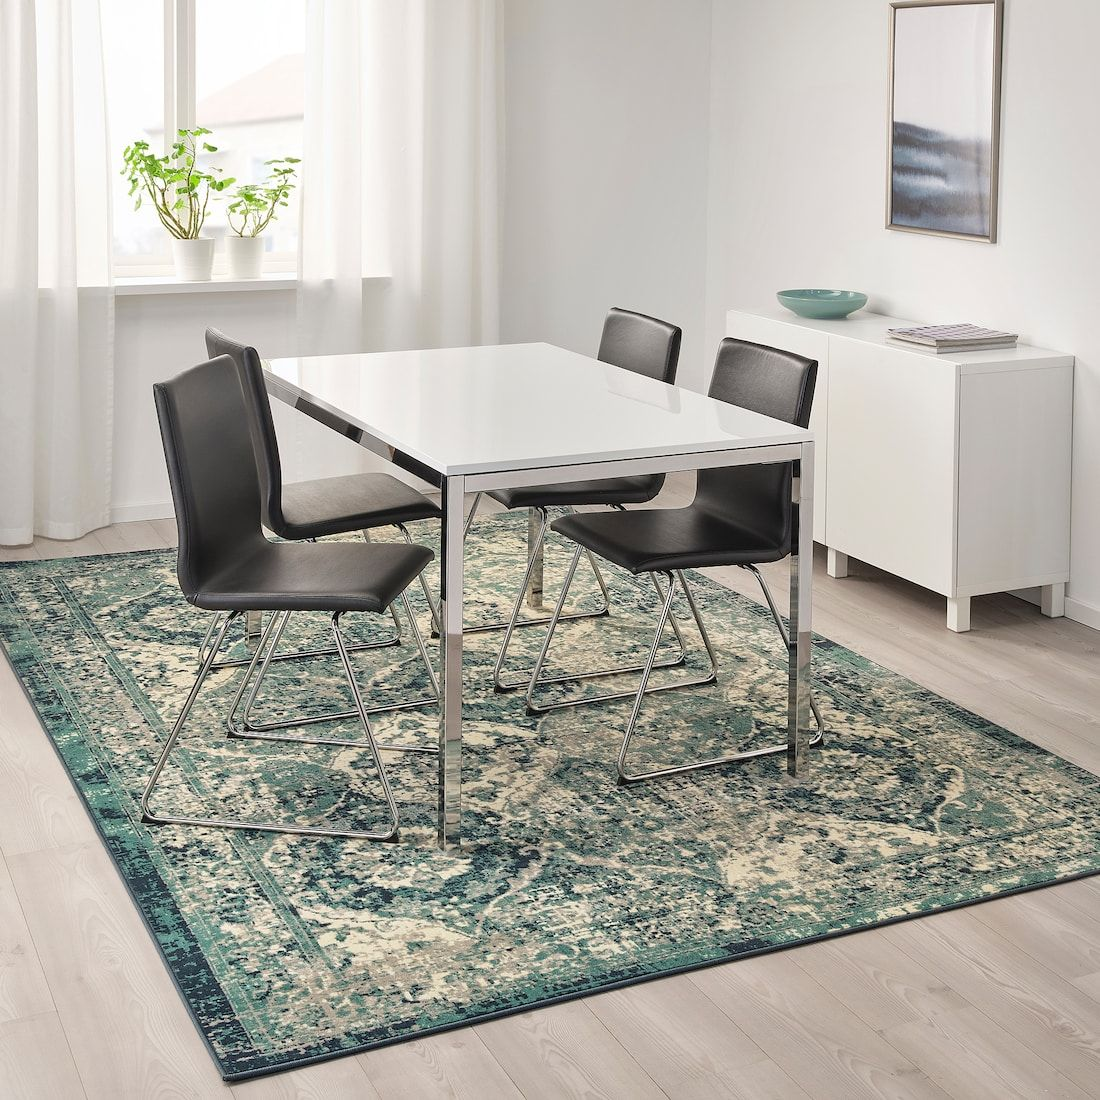 VONSBÄK Rug, low pile - green 200x300 cm | Green rug ...